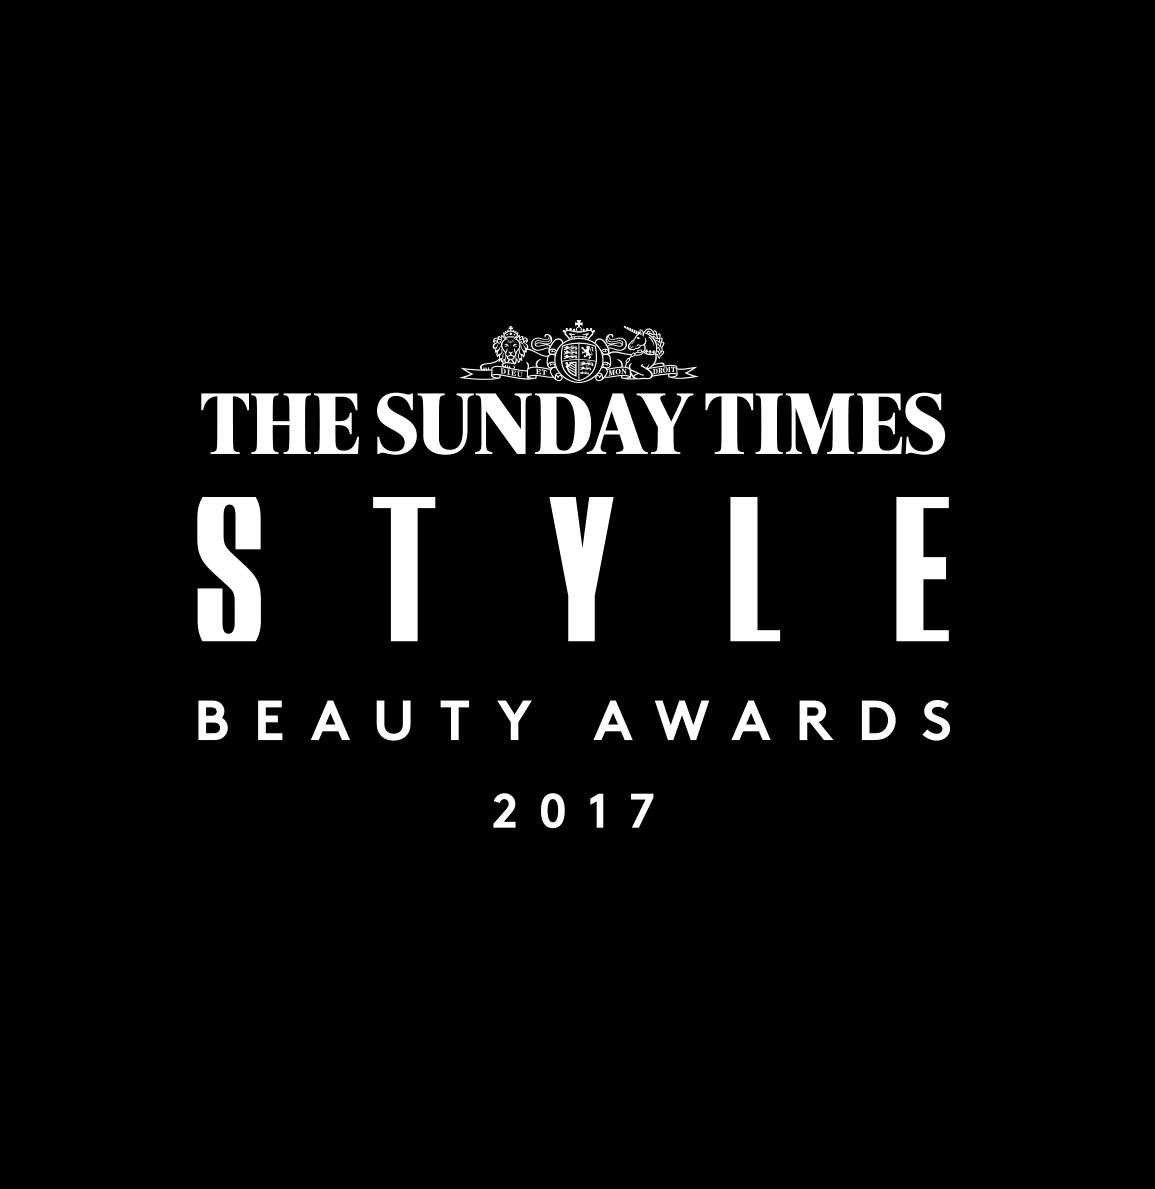 The Style Beauty Awards 2017